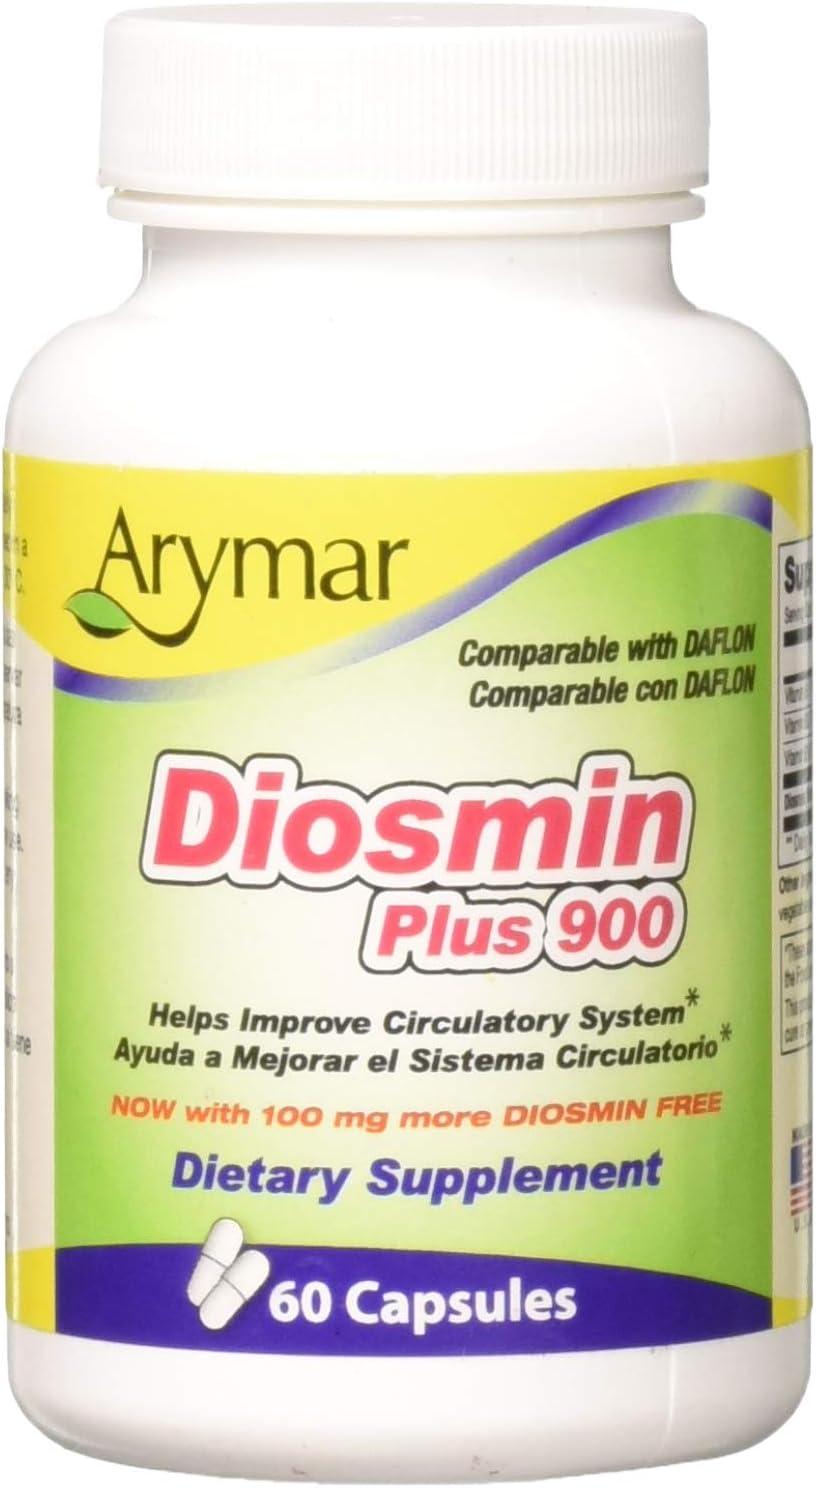 Arymar Diosmin Plus 900, 60 Count